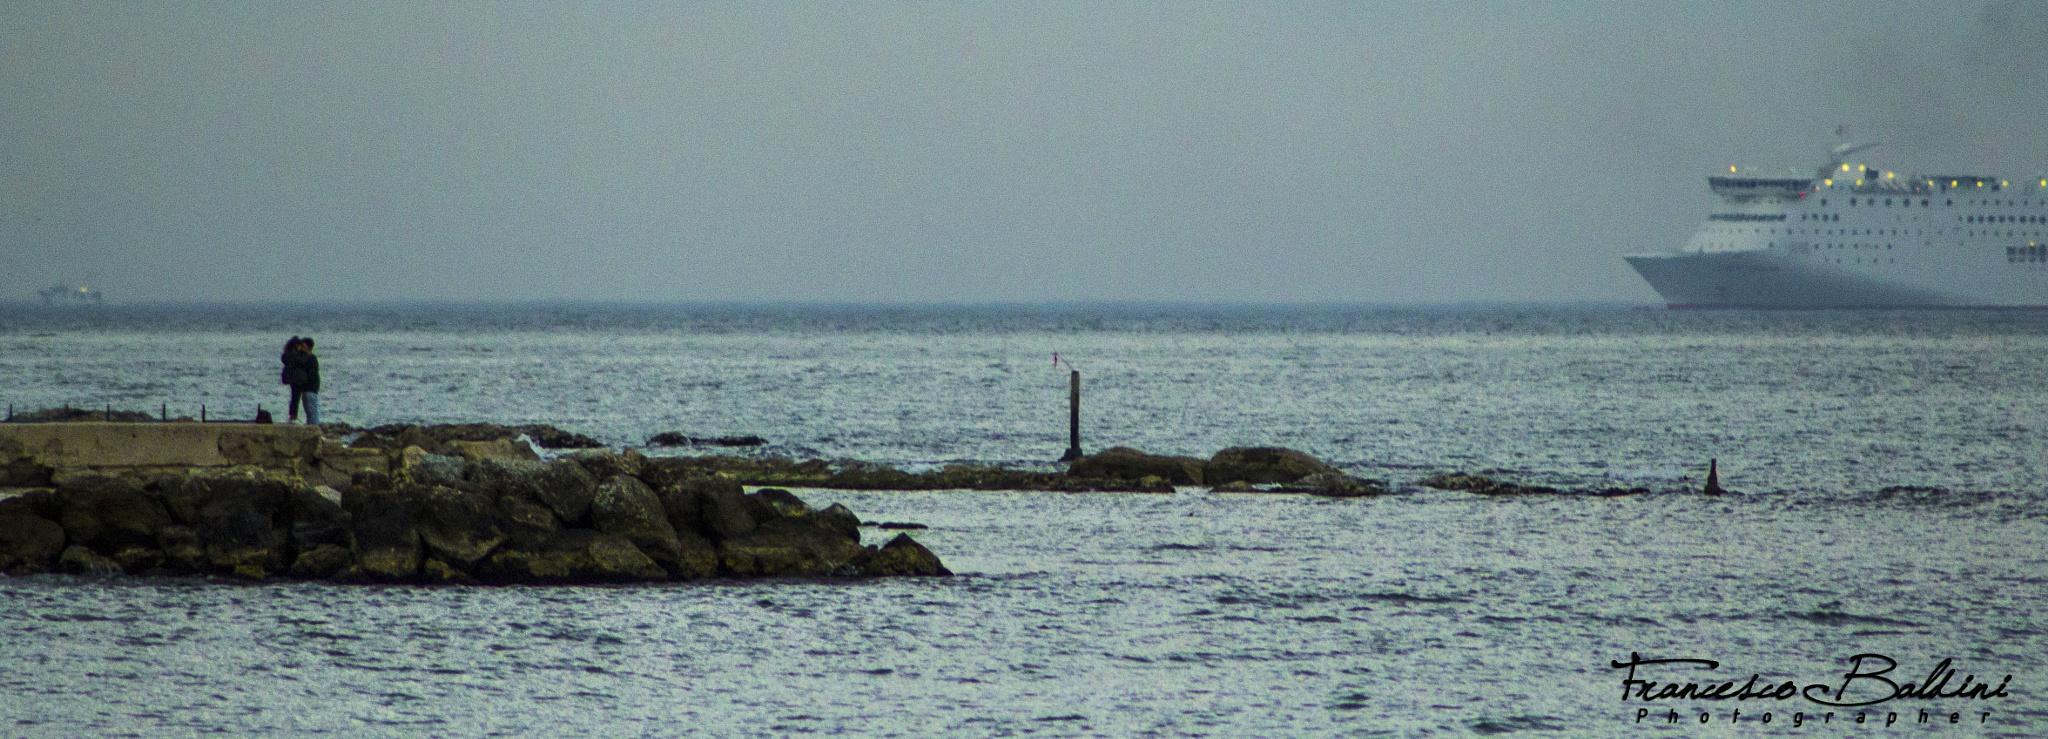 Two lovers on the sea by Francesco Baldini